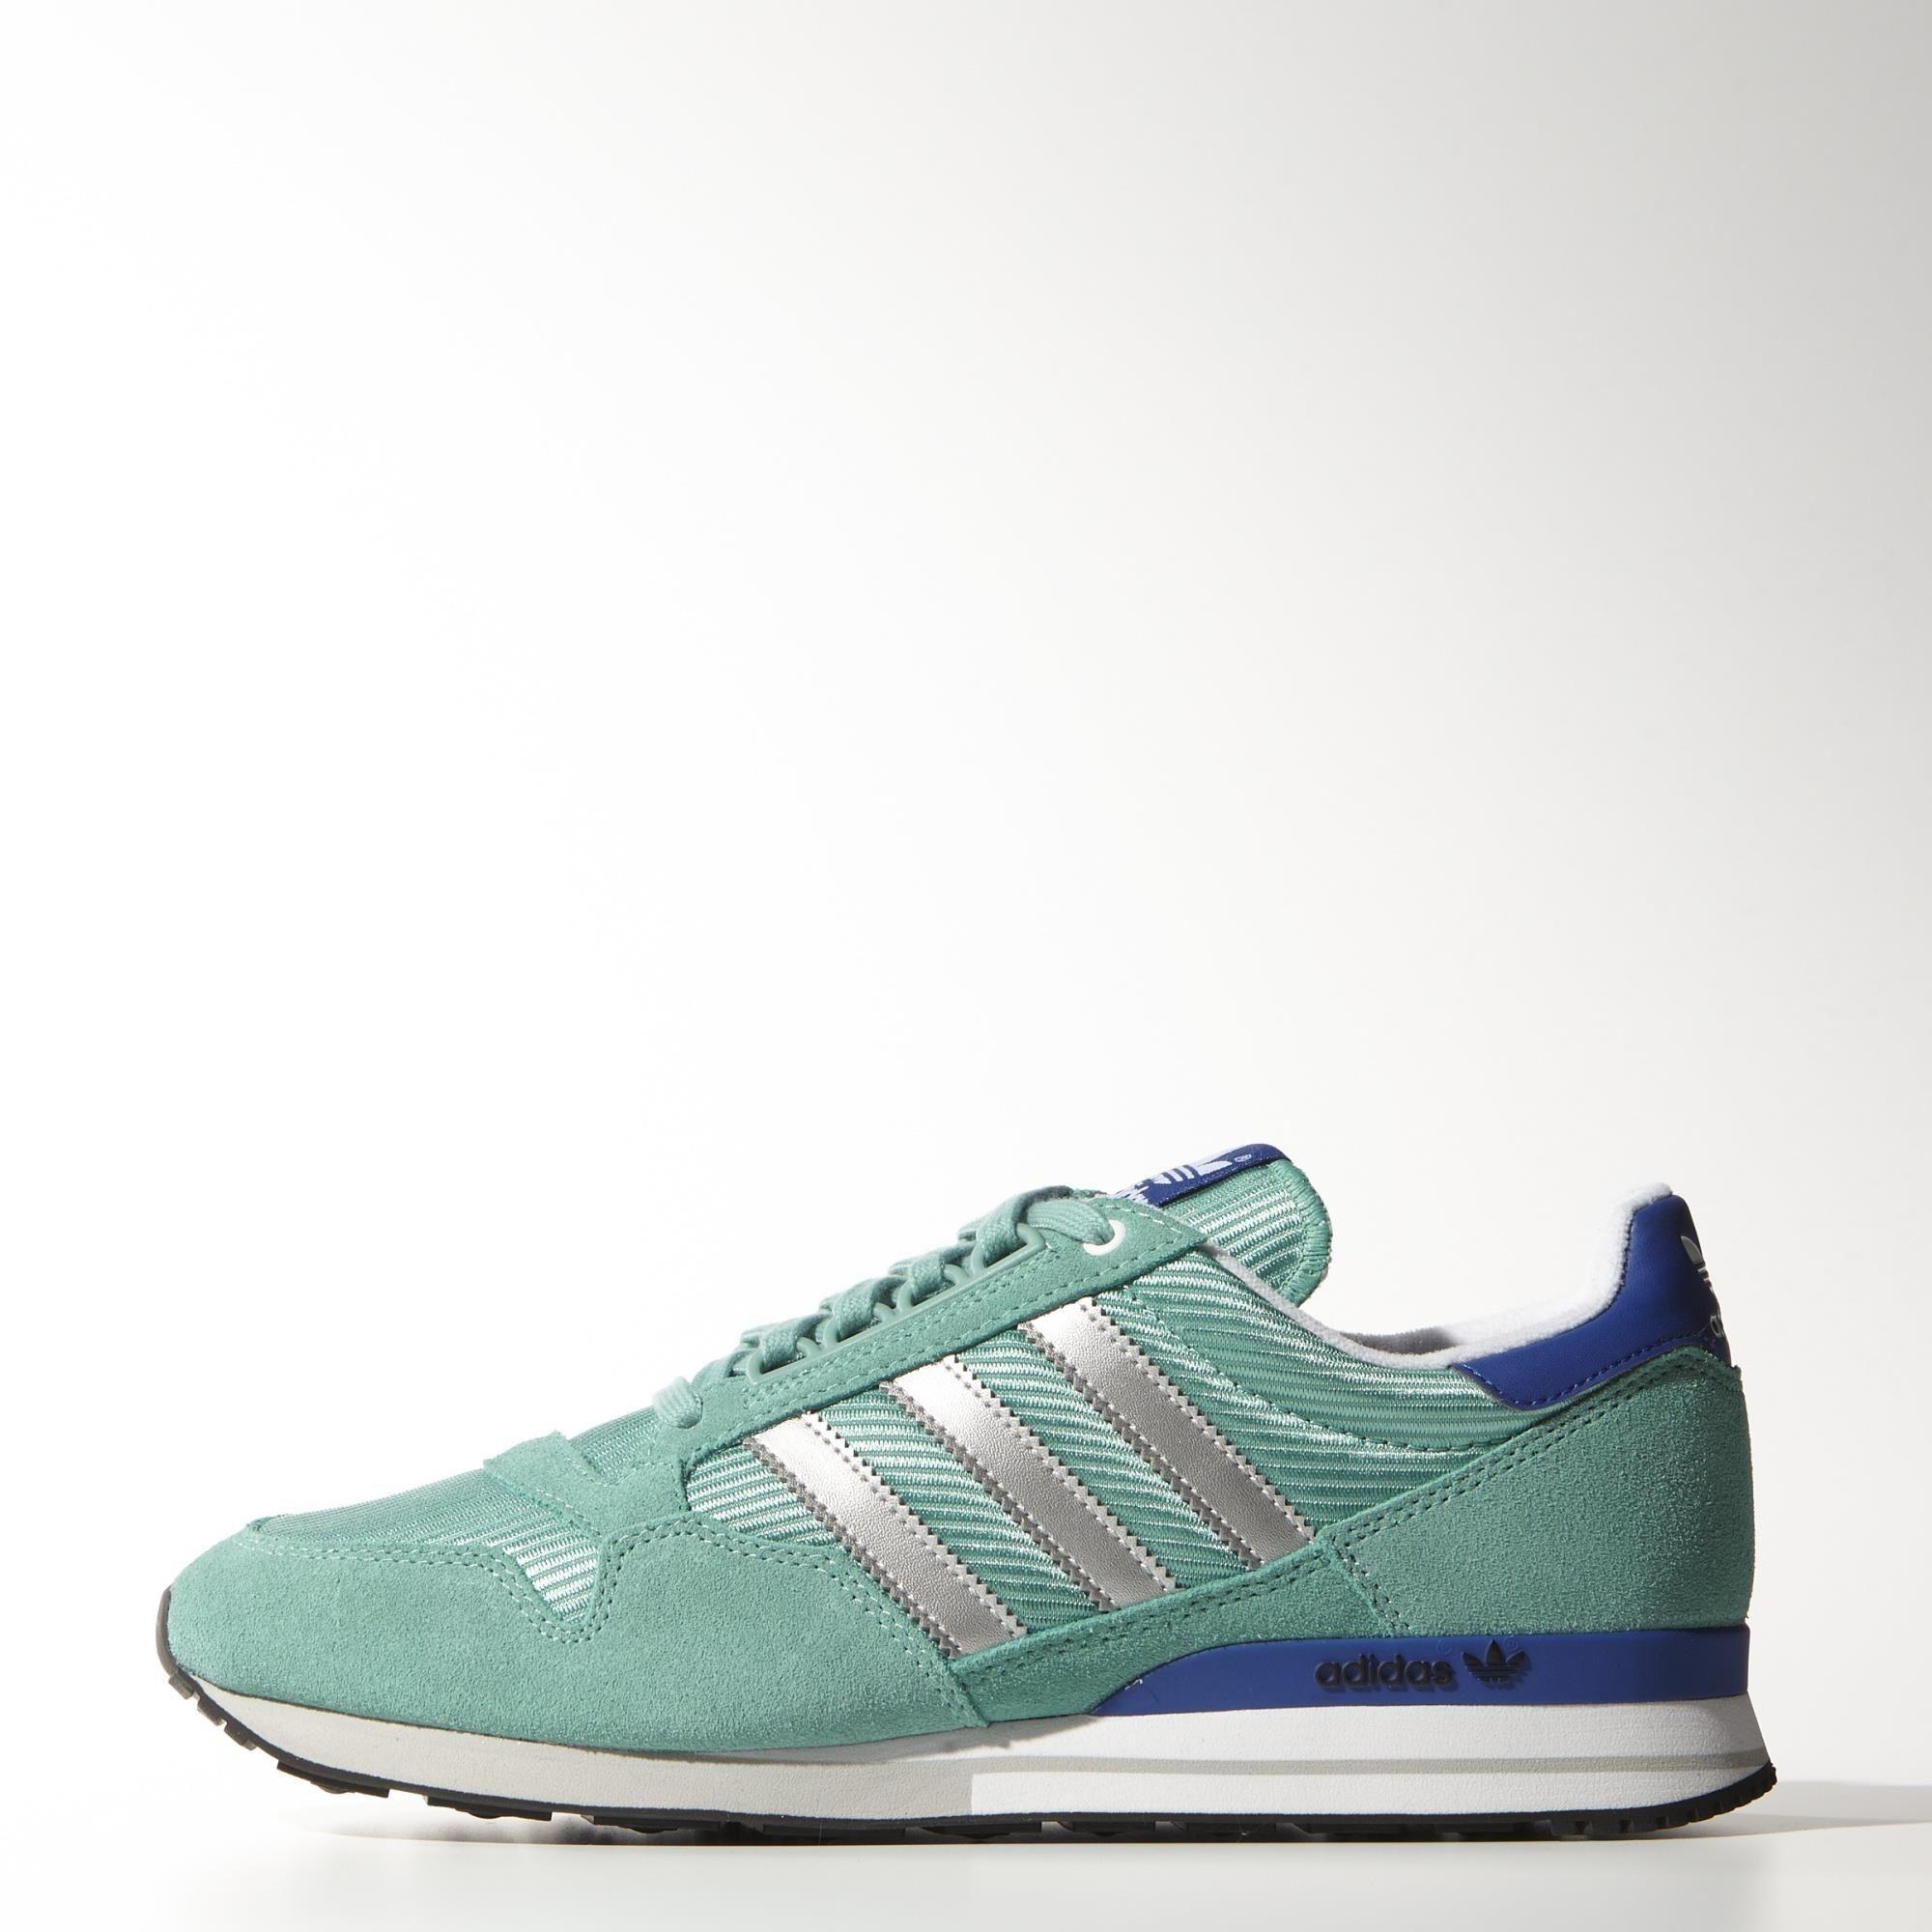 huge selection of 57c2c 4aafb adidas zx 500 og verde